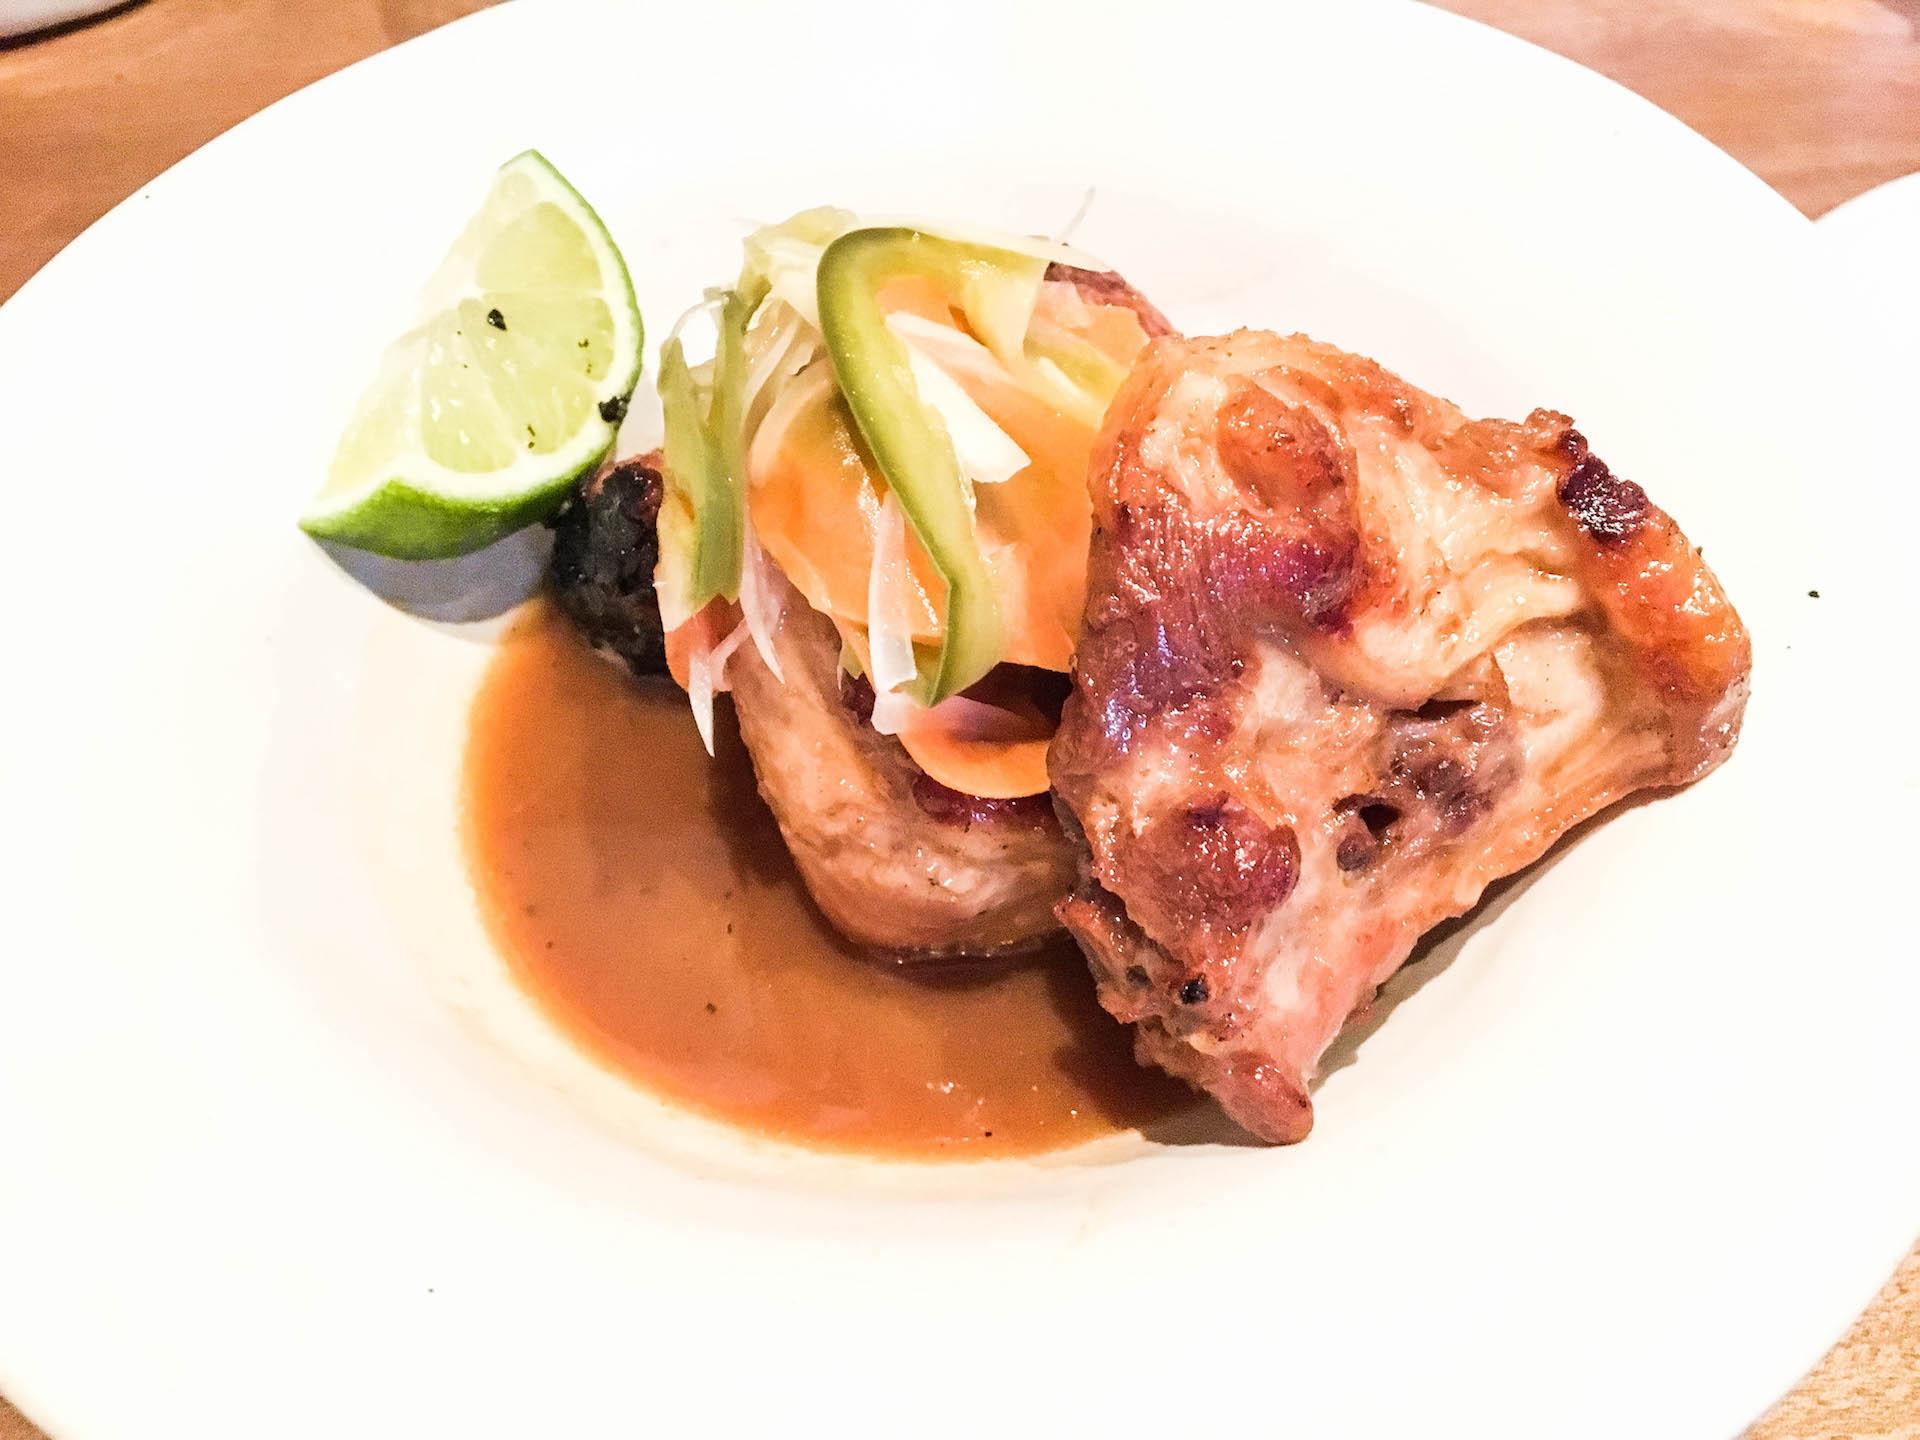 David Lee's favorite dish on the menu, the adobo turkey tail.